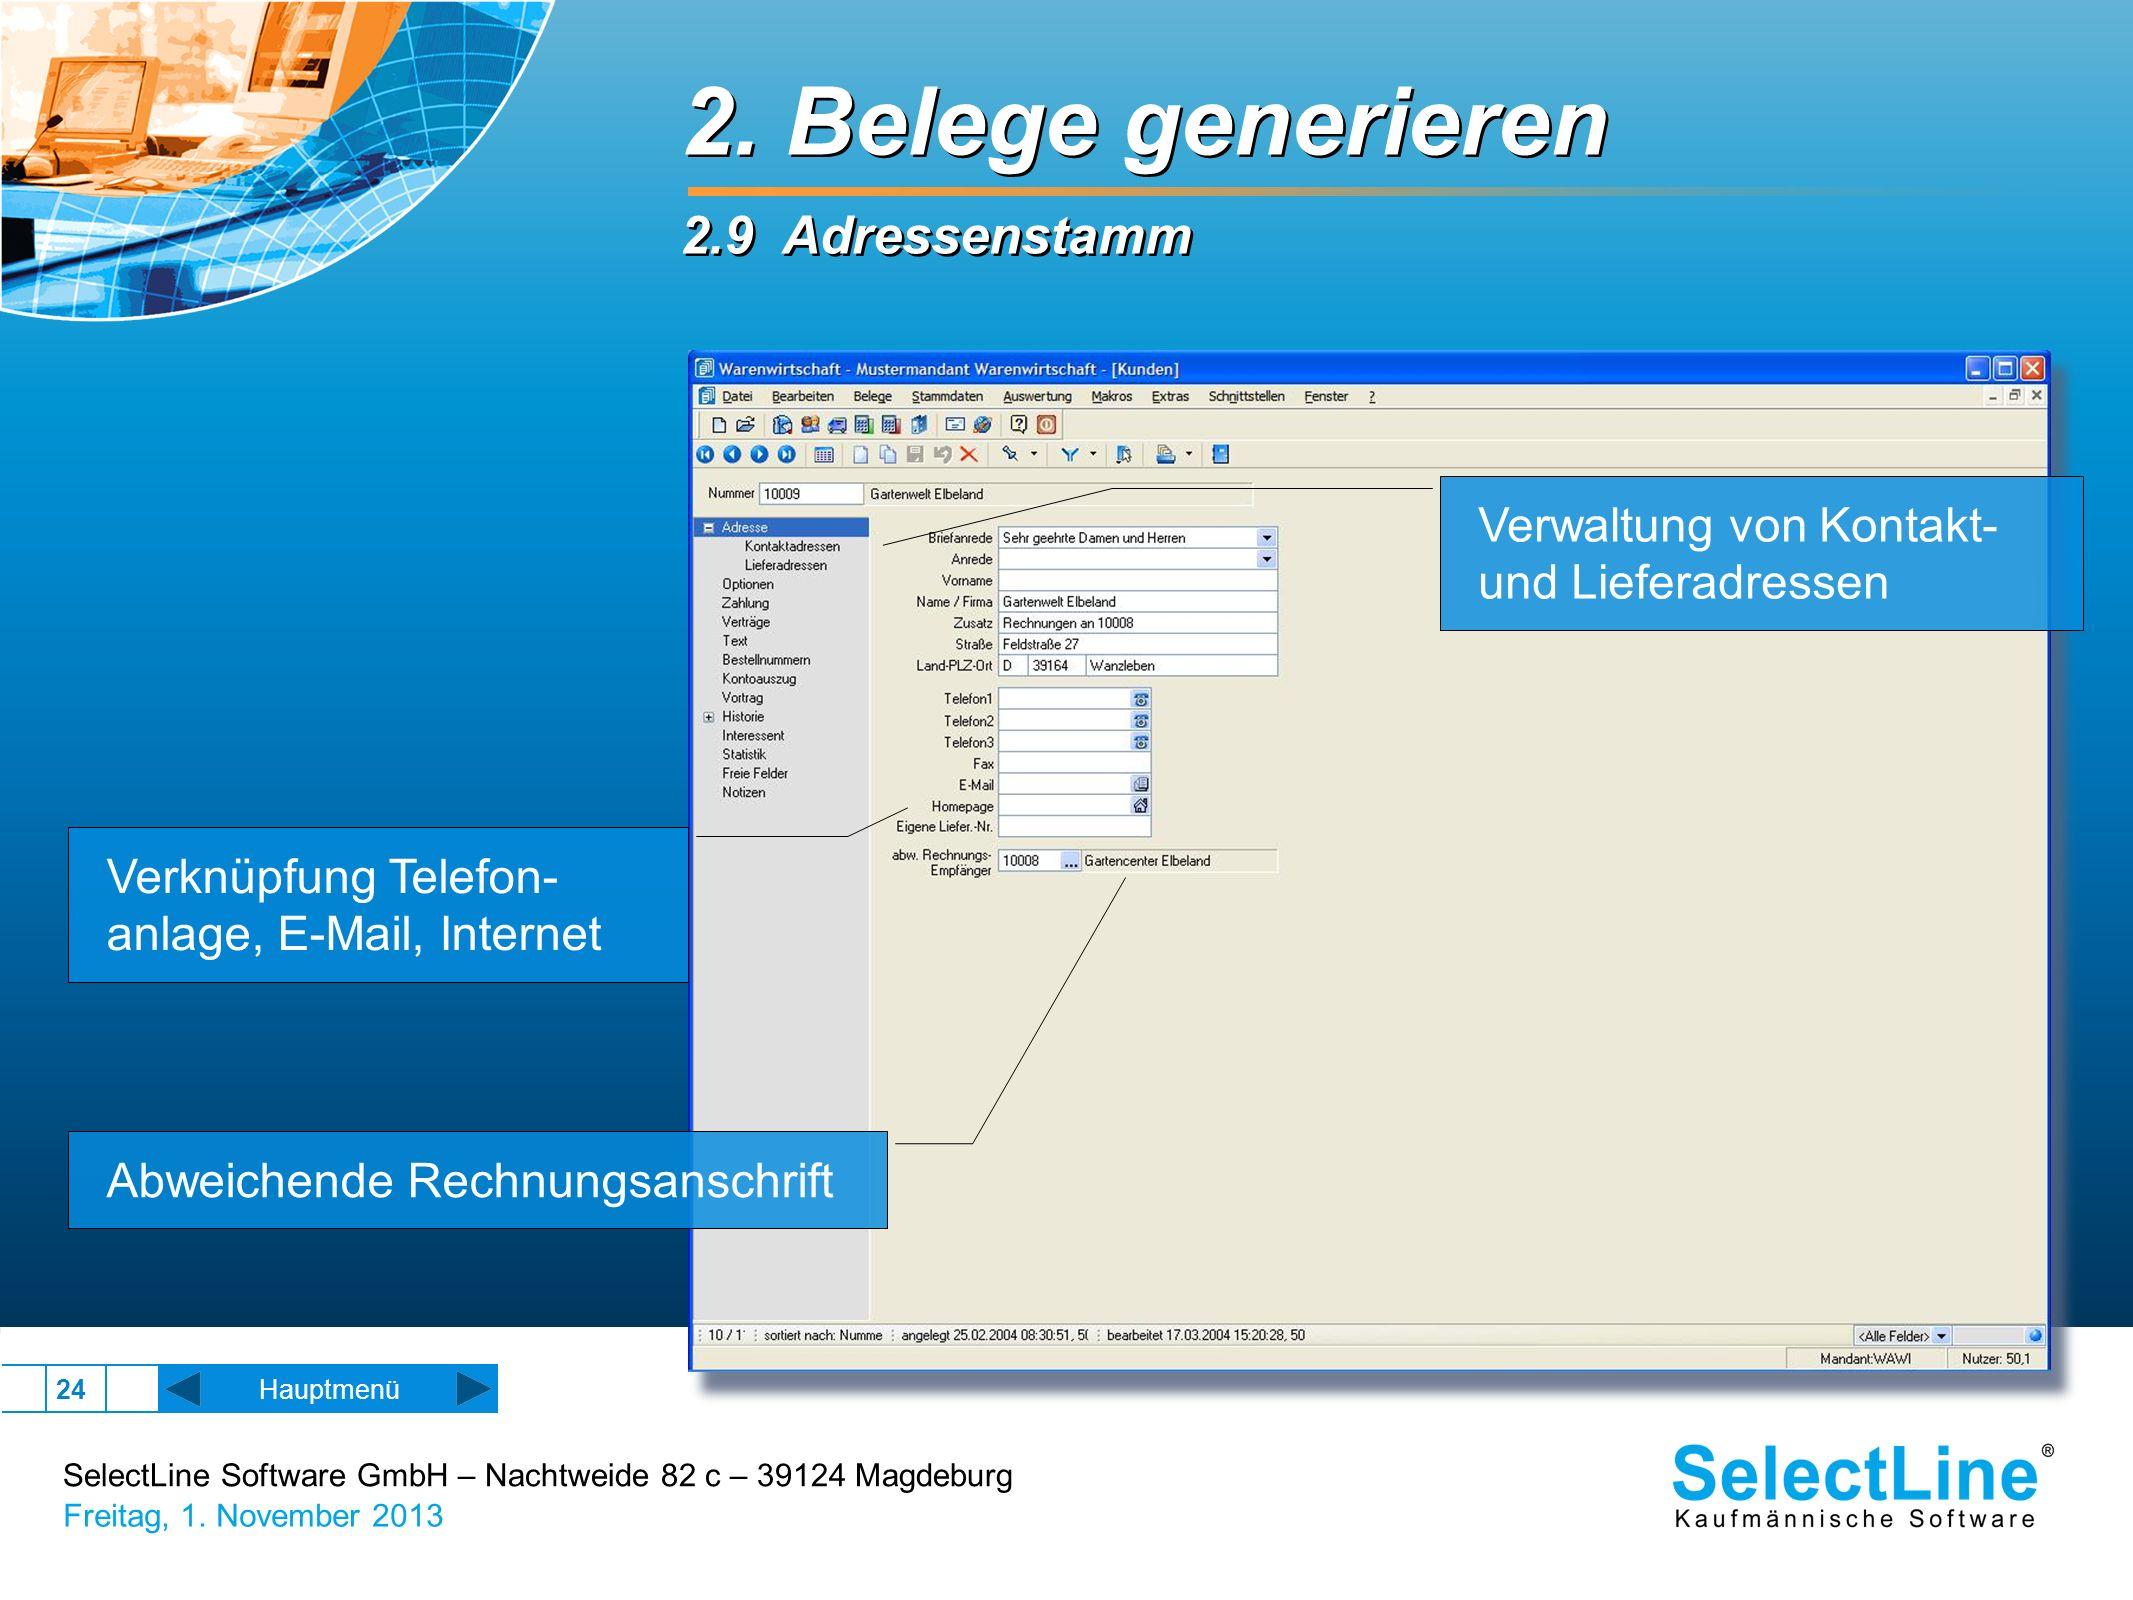 SelectLine Software GmbH – Nachtweide 82 c – 39124 Magdeburg Freitag, 1. November 2013 24 2. Belege generieren 2.9 Adressenstamm 2. Belege generieren